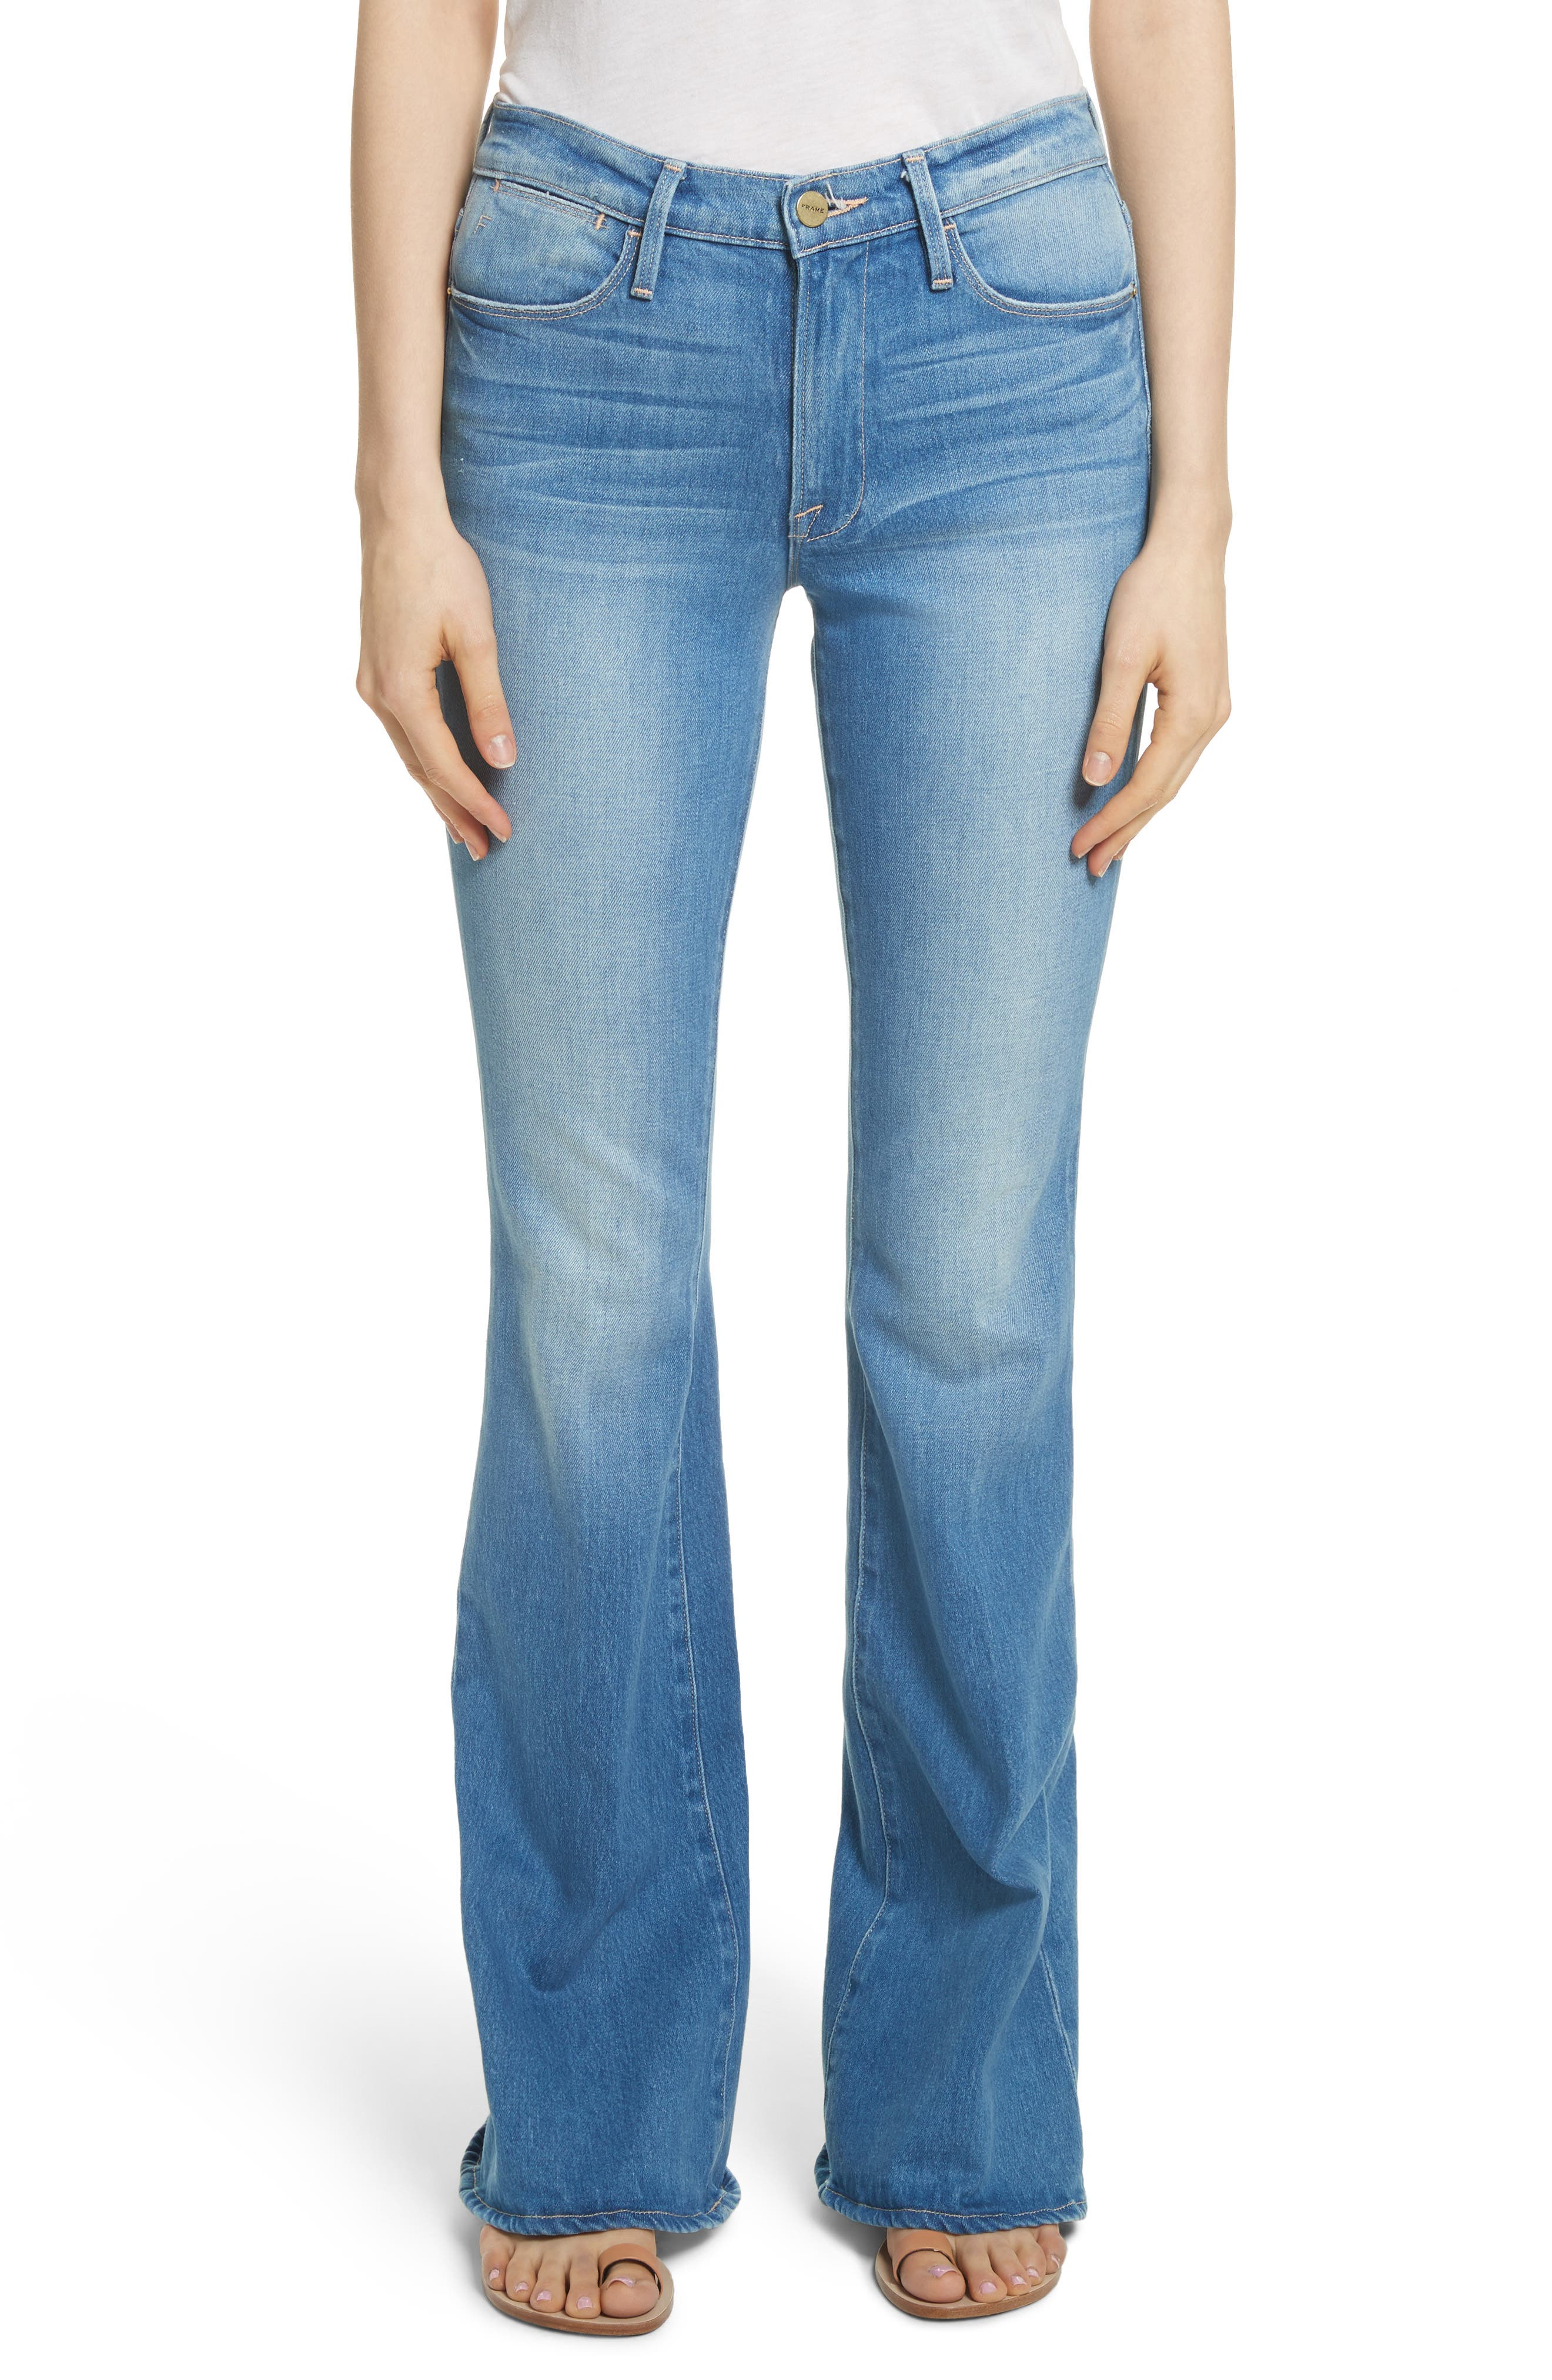 Le High Flare Jeans,                             Main thumbnail 1, color,                             Brightwalton